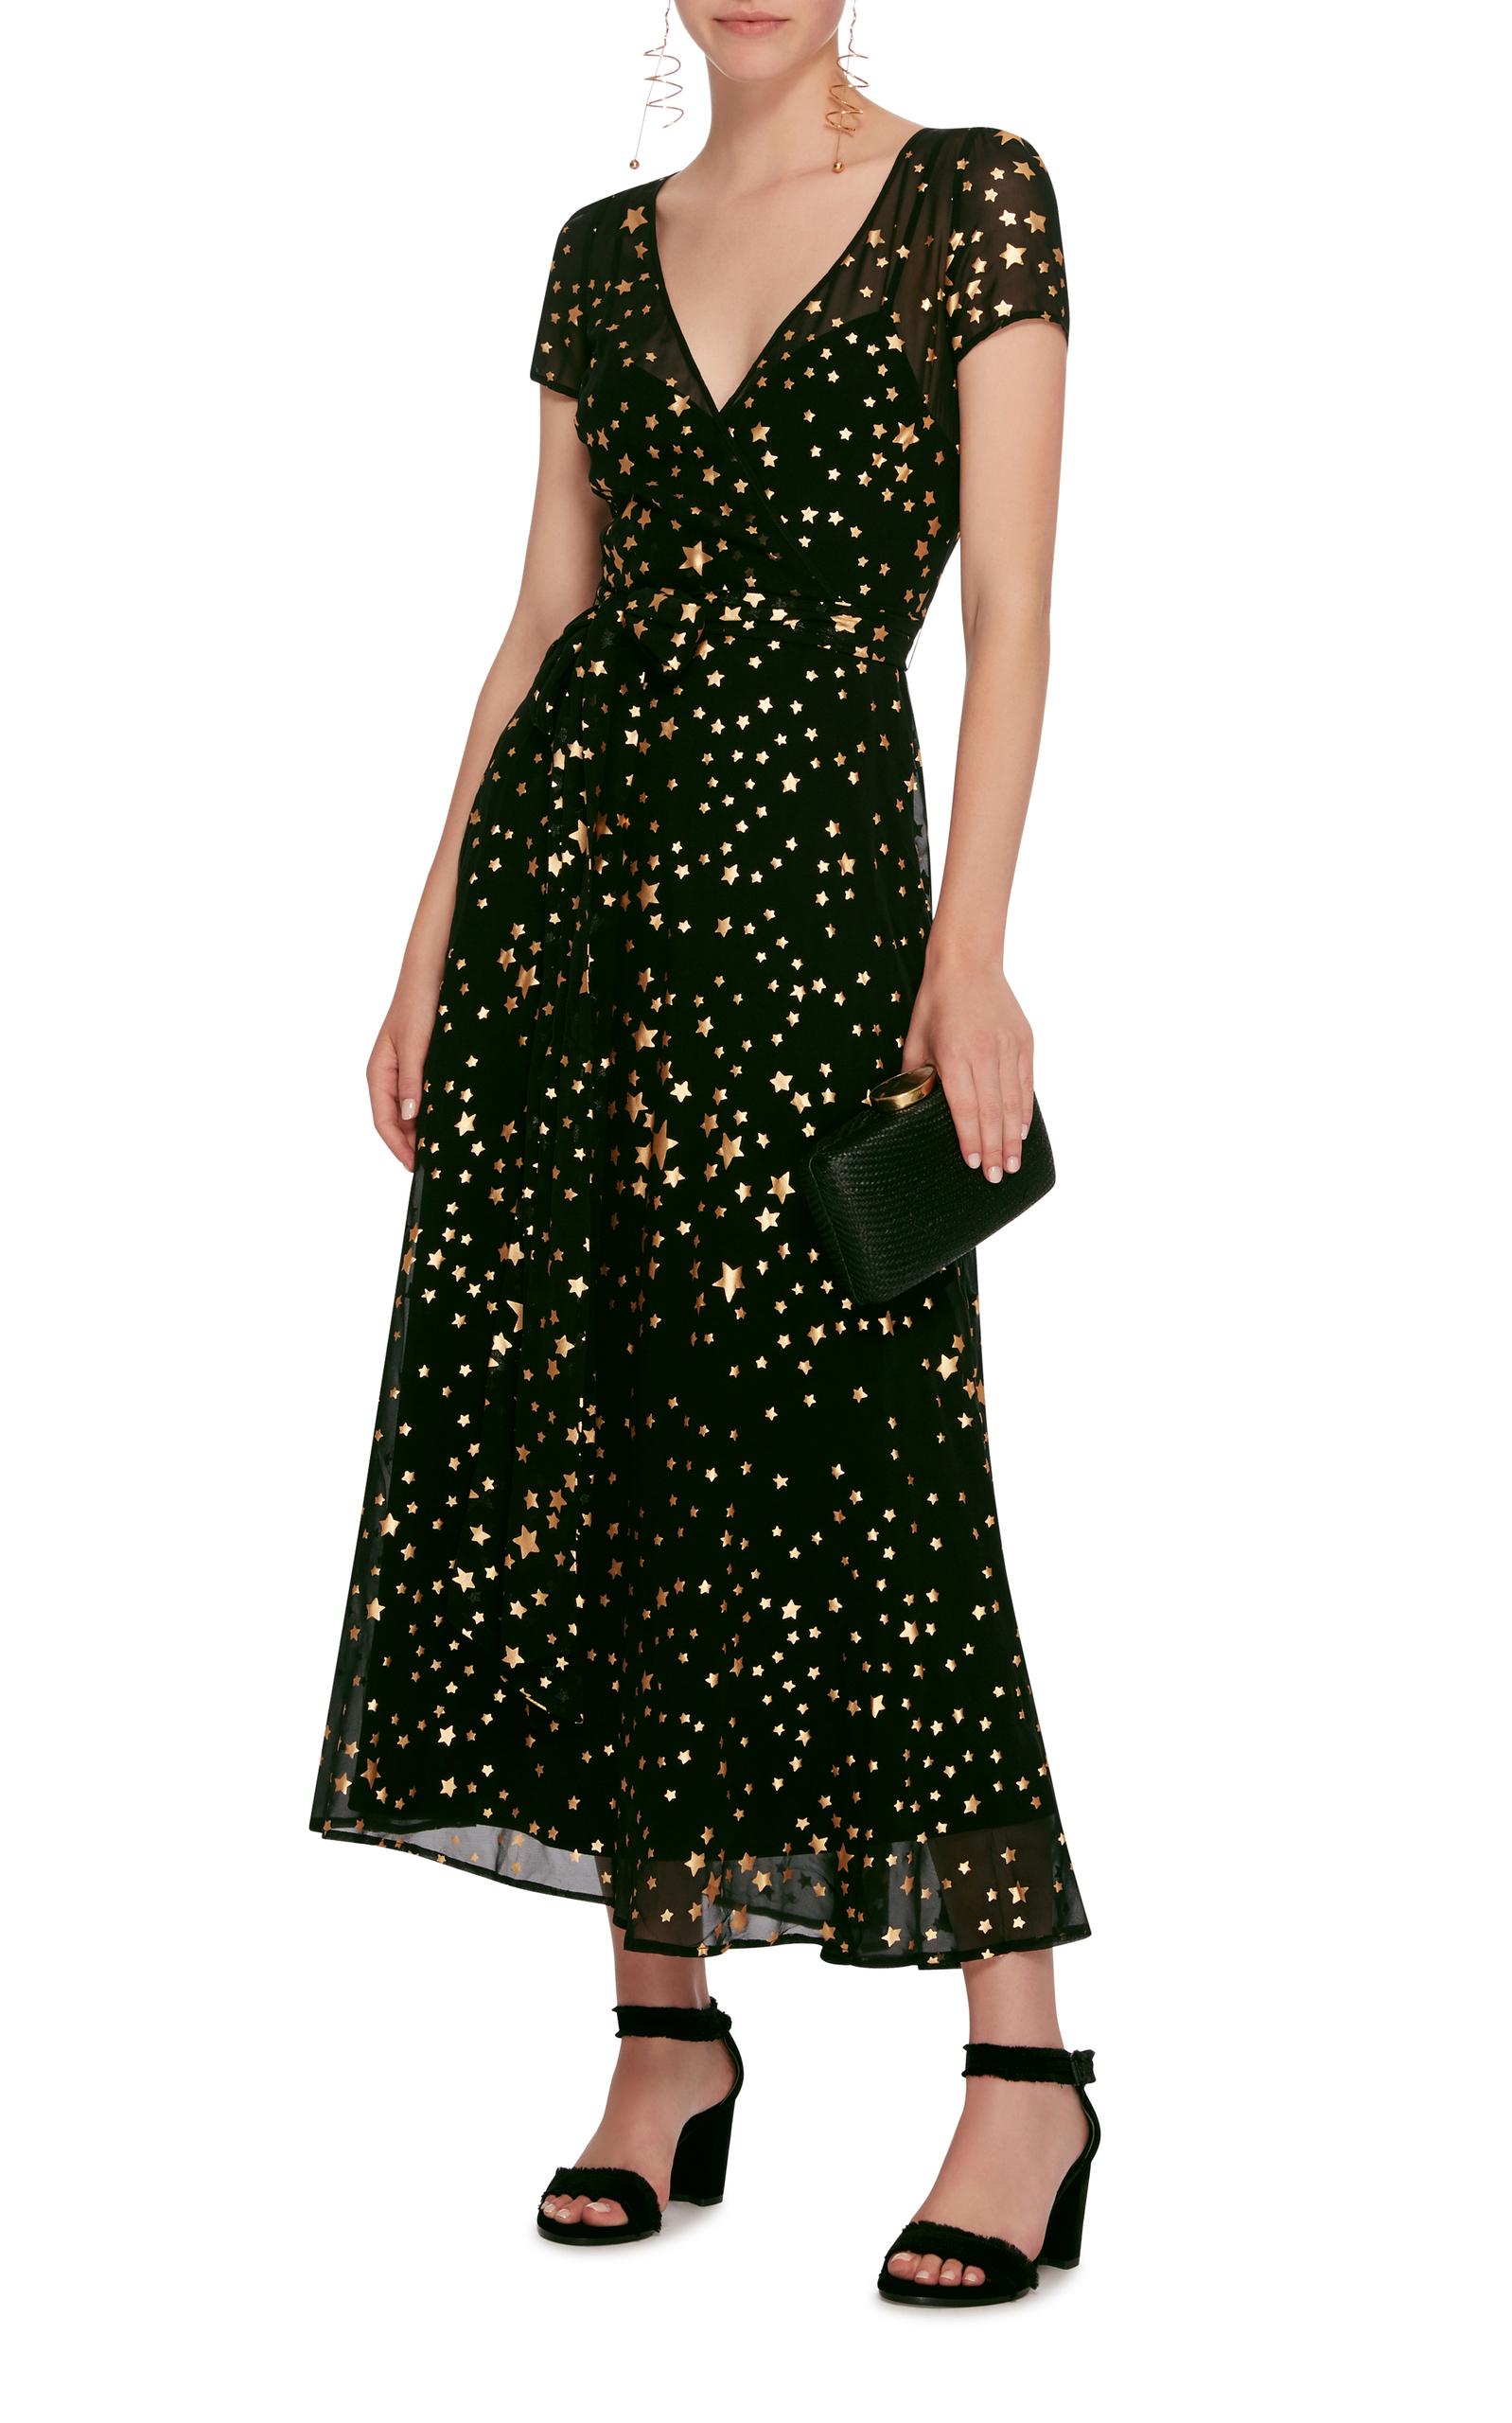 c03e32eb3d3 Red ValentinoStar Print Silk Georgette Maxi Dress. CLOSE. Loading